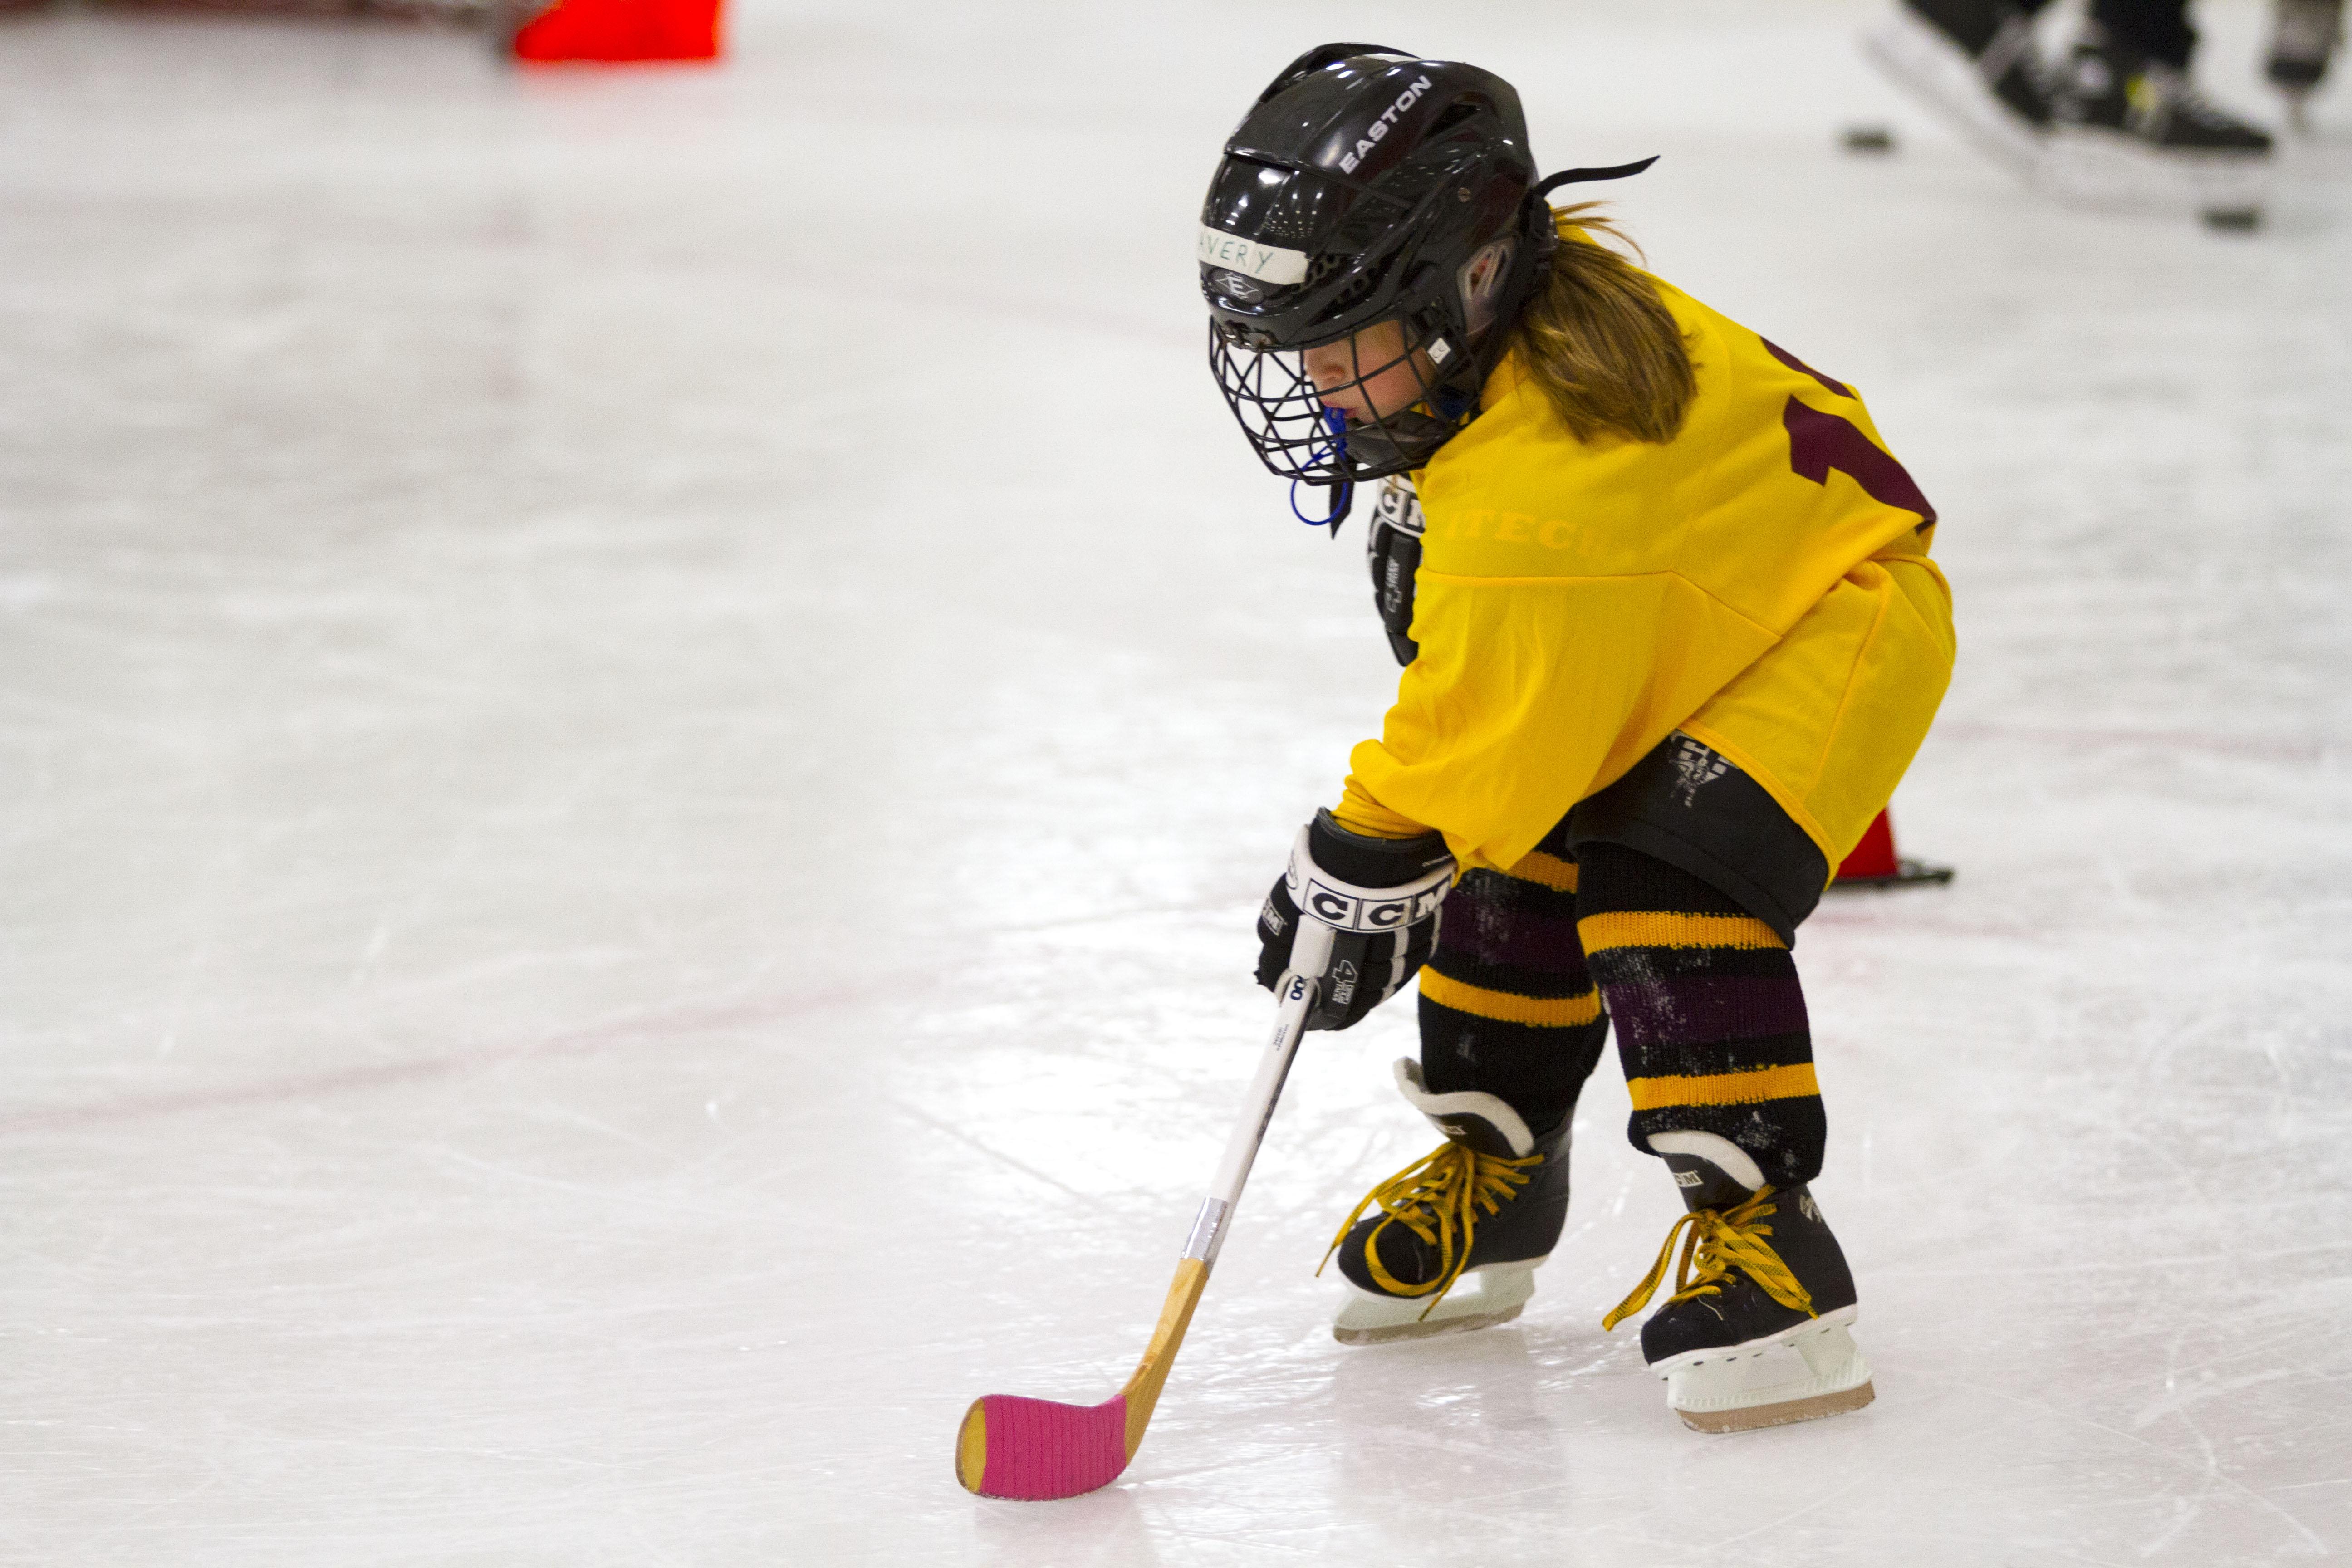 Wny Amateur Youth Hockey Leagues - Random Photo Gallery-2518